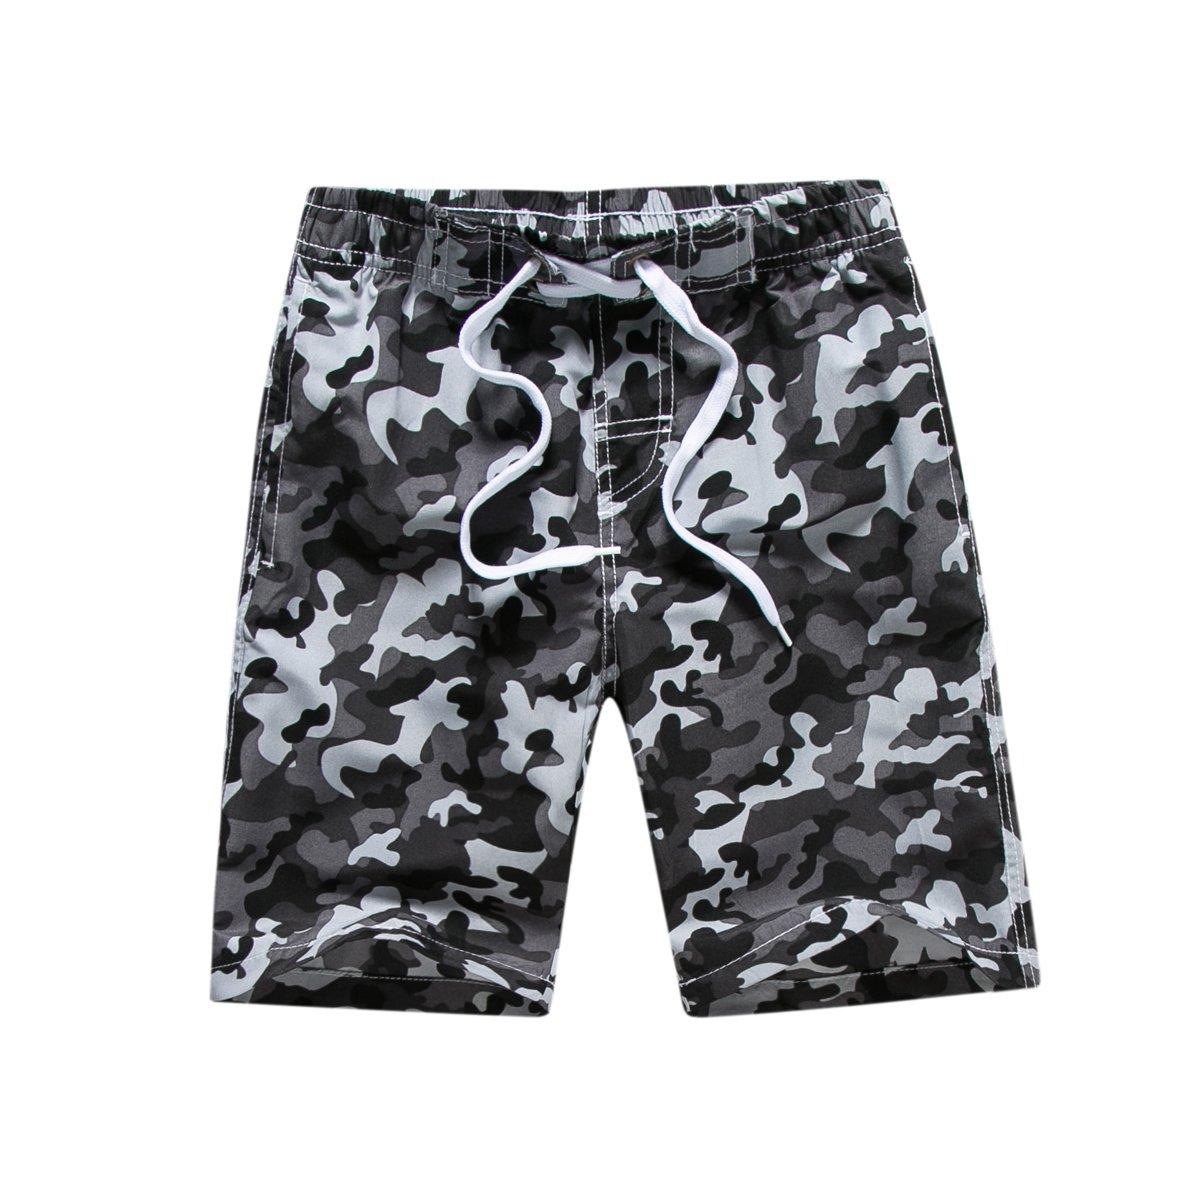 Kute 'n' Koo Big Boy's Swim Shorts, Quick Dry Camo Swim Trunks Boys Bathing Suits